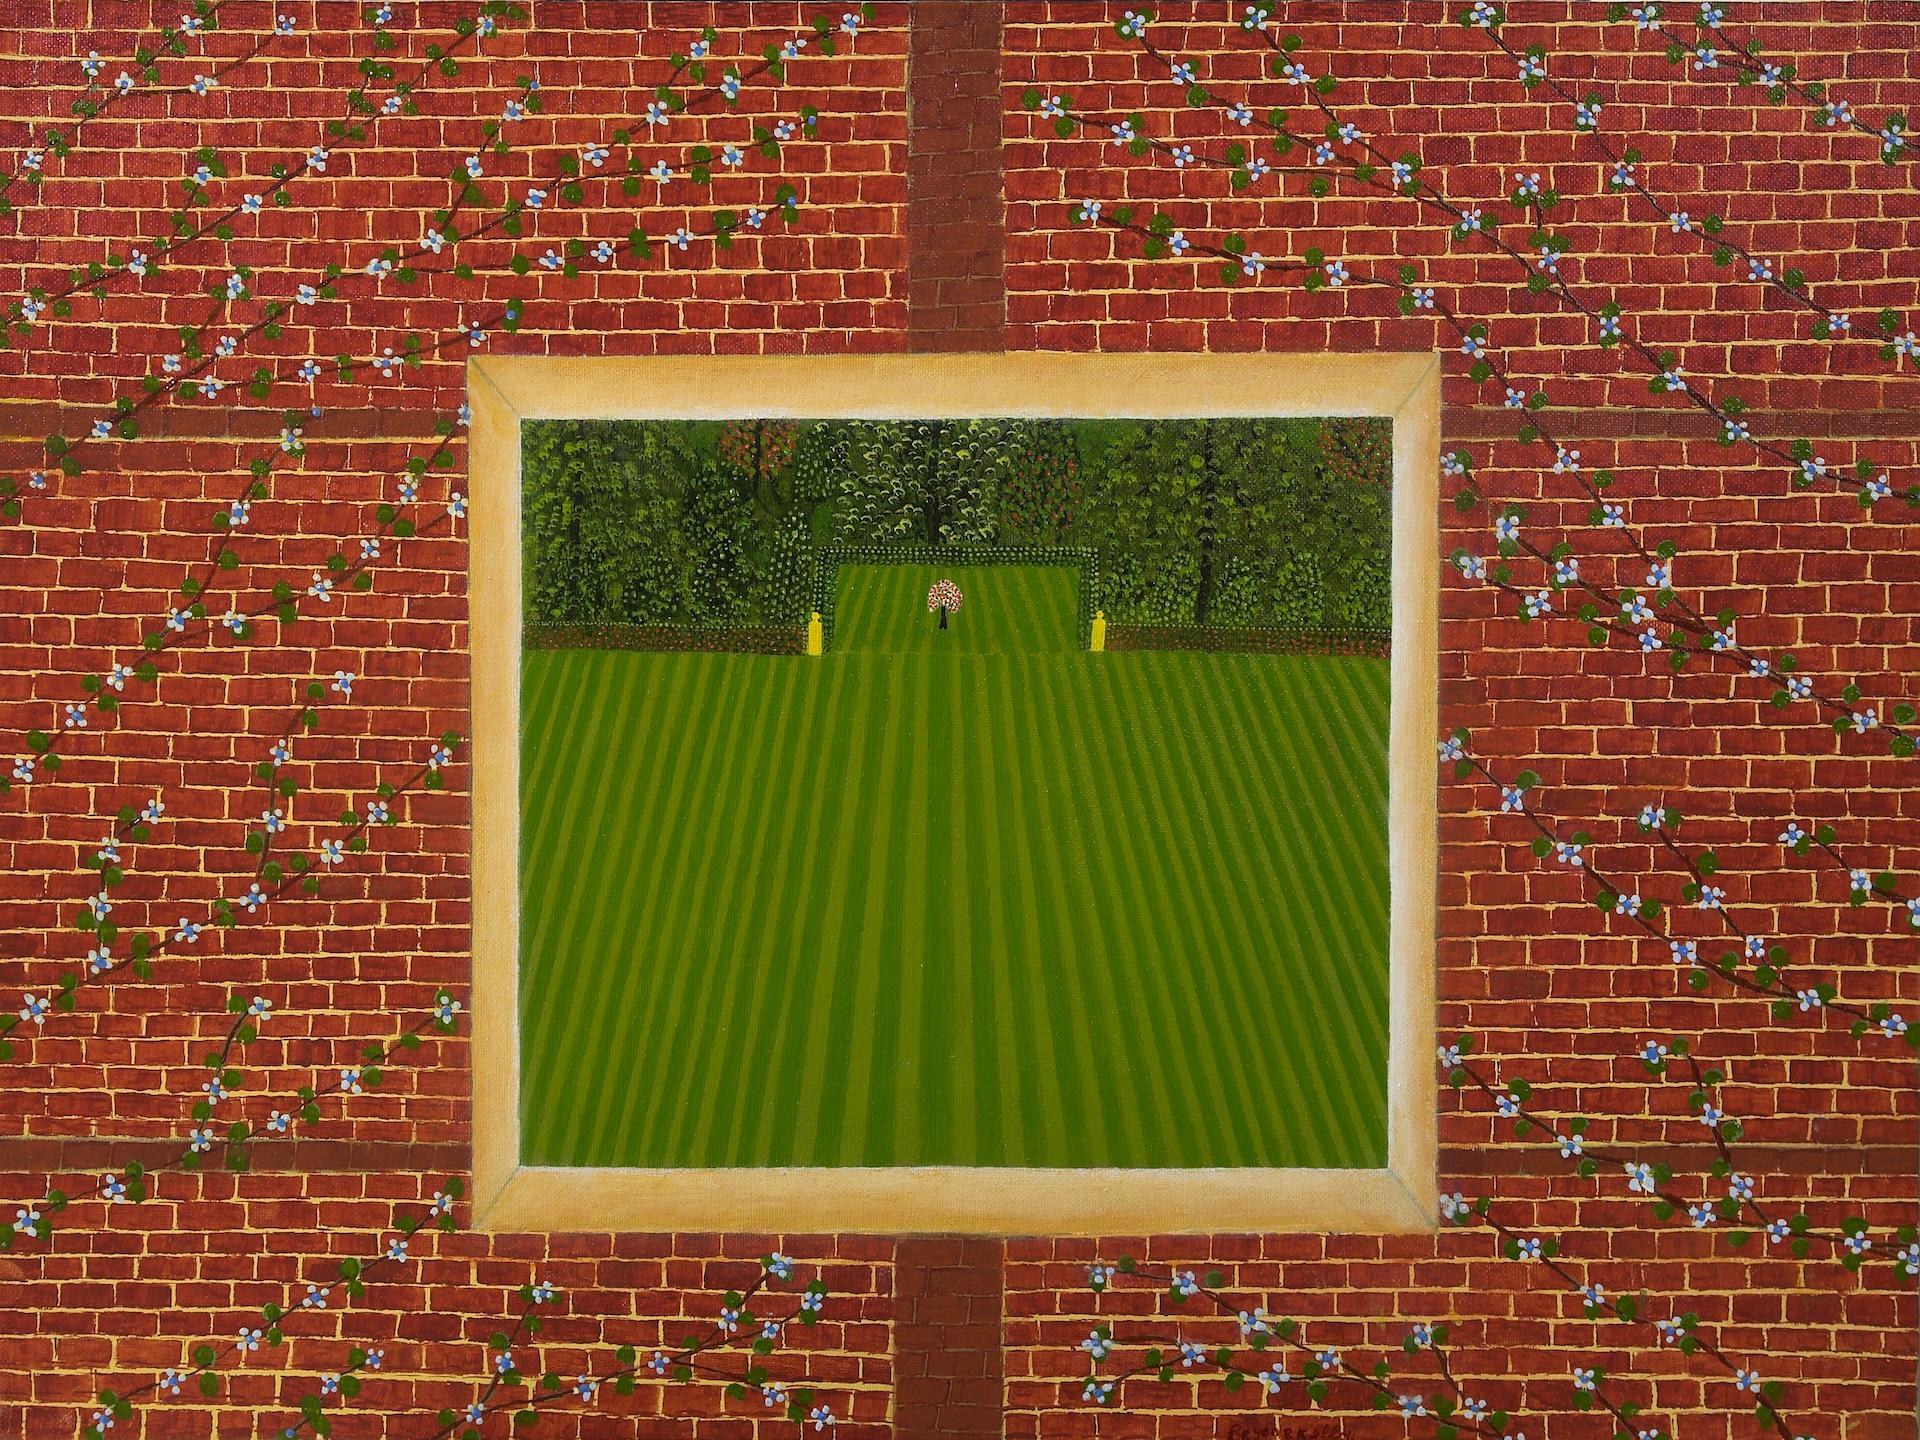 The Rear Lawn